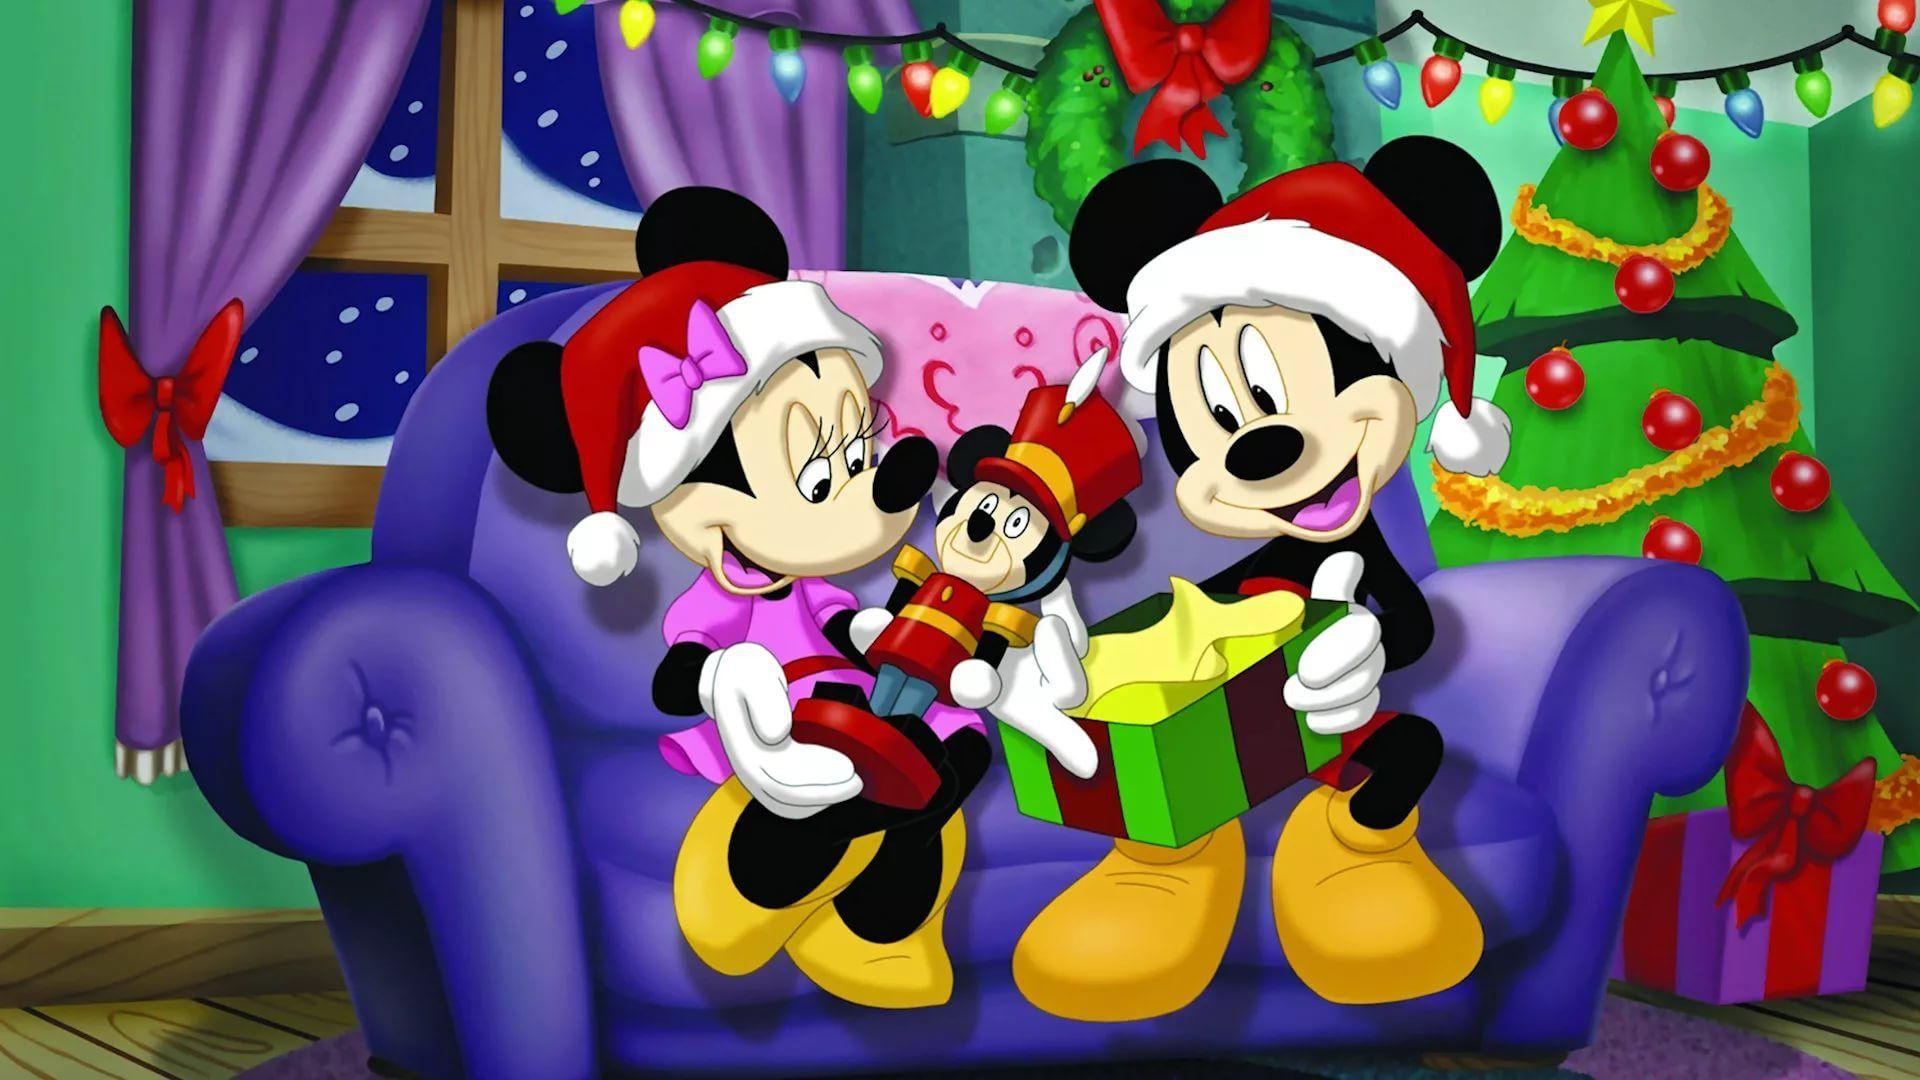 Disney Christmas wallpaper photo